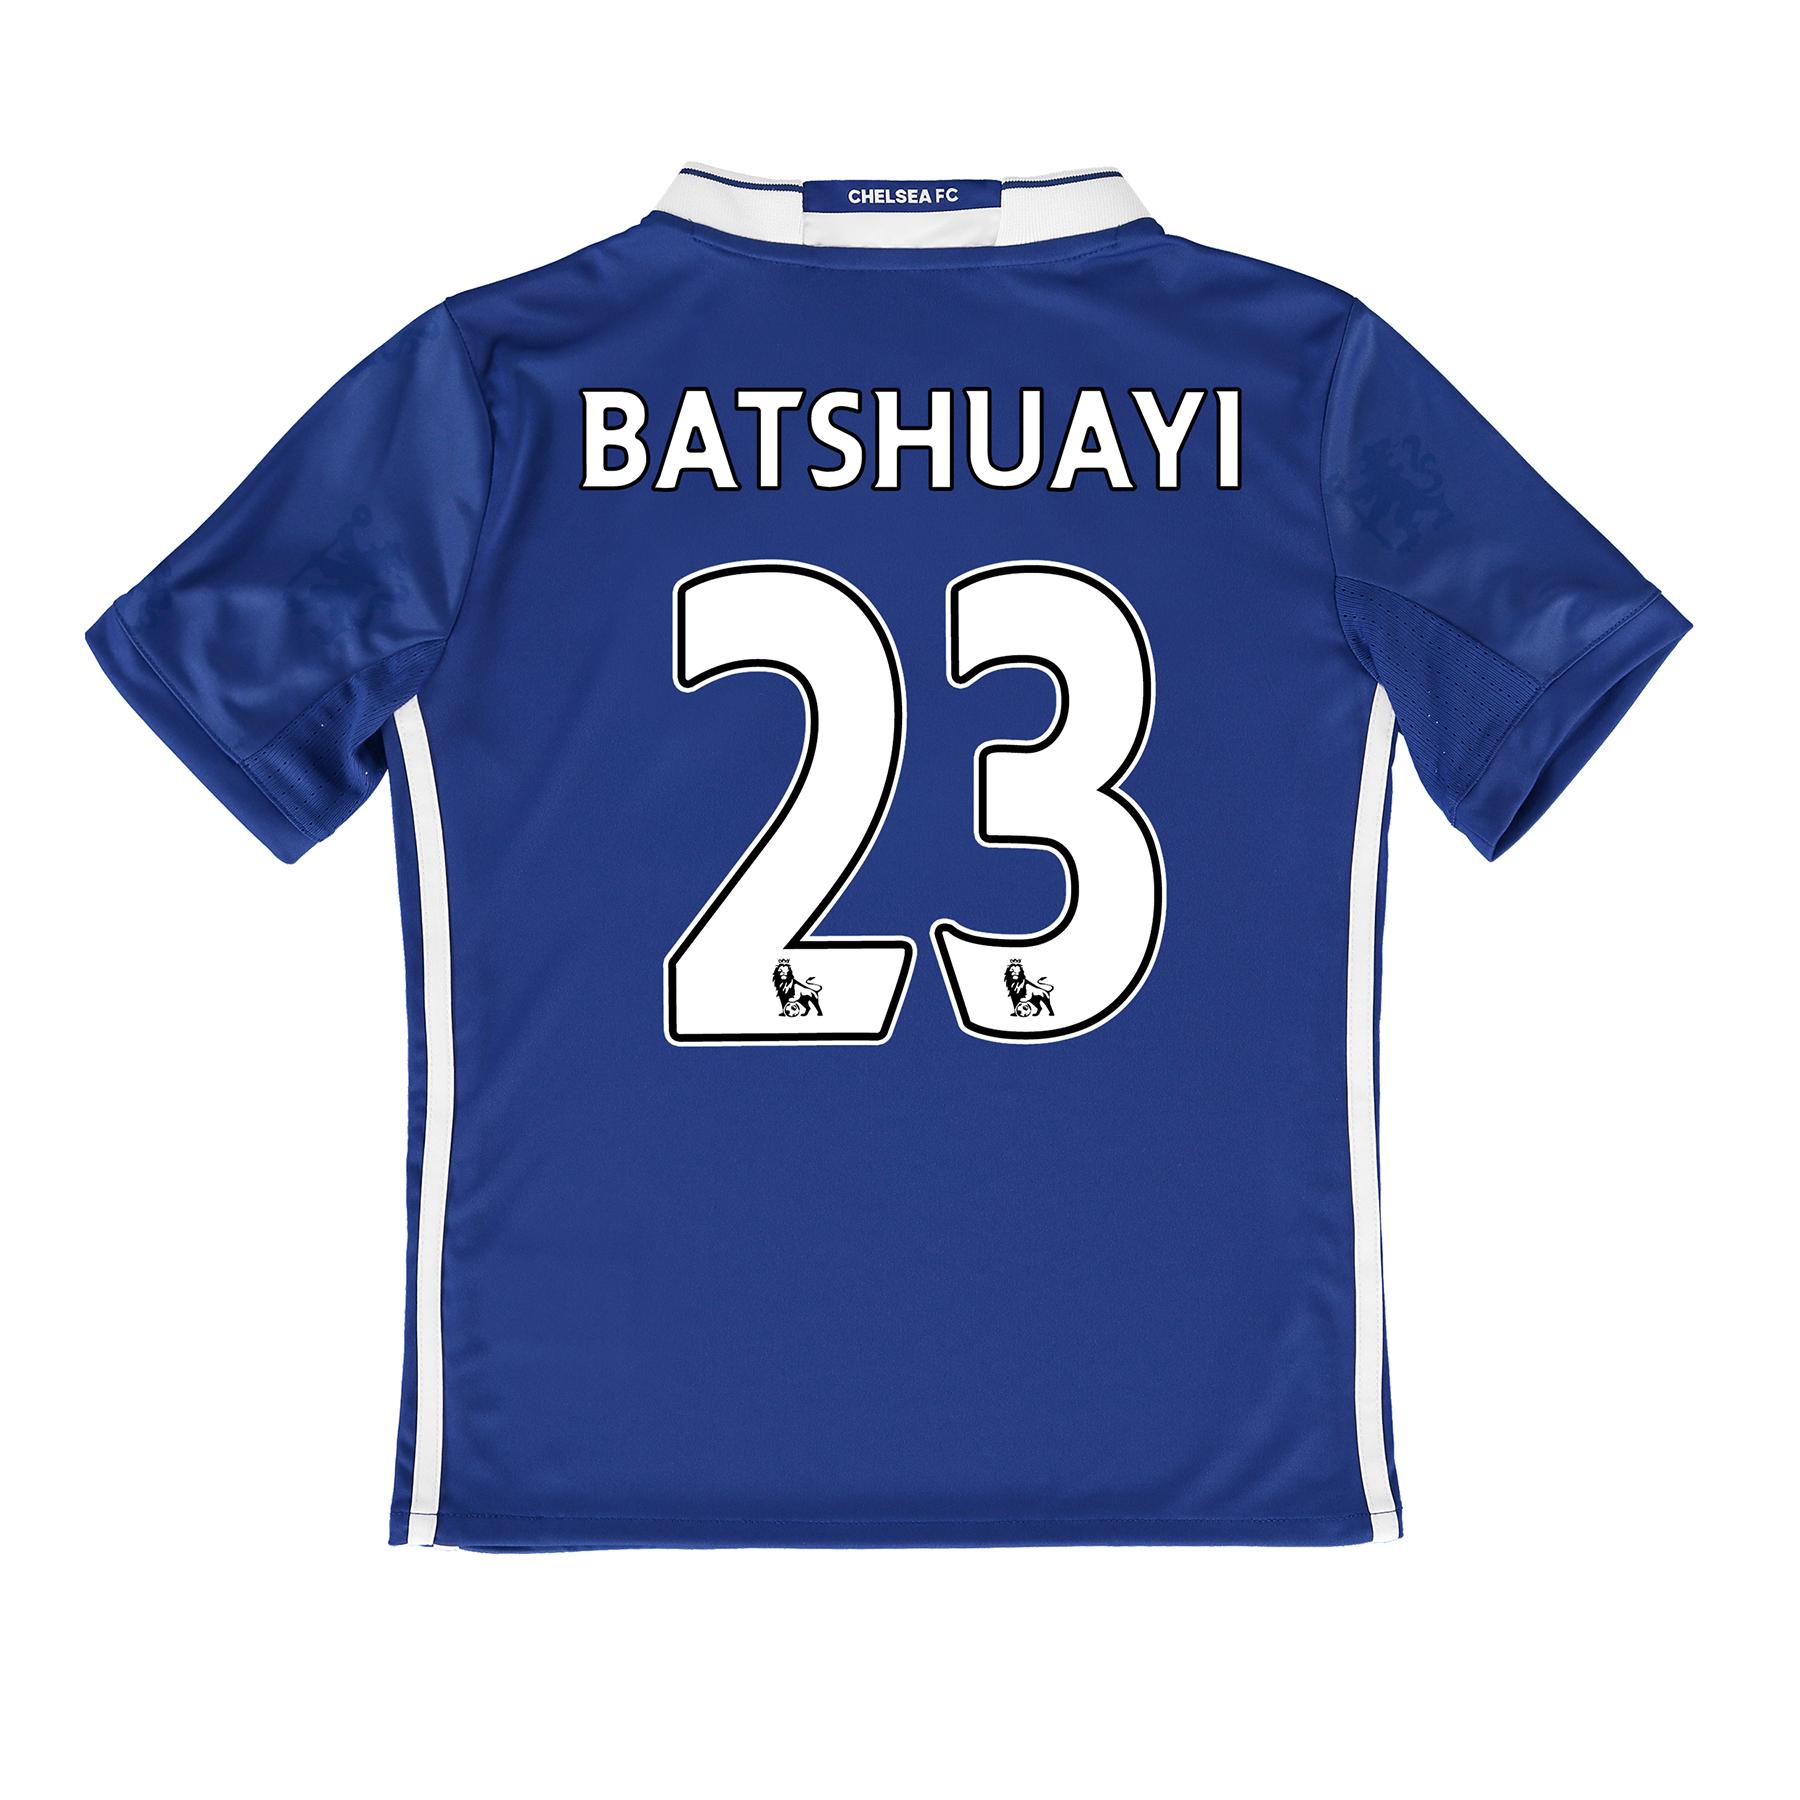 Chelsea Home Shirt 2016-17 - Kids with Batshuayi 23 printing